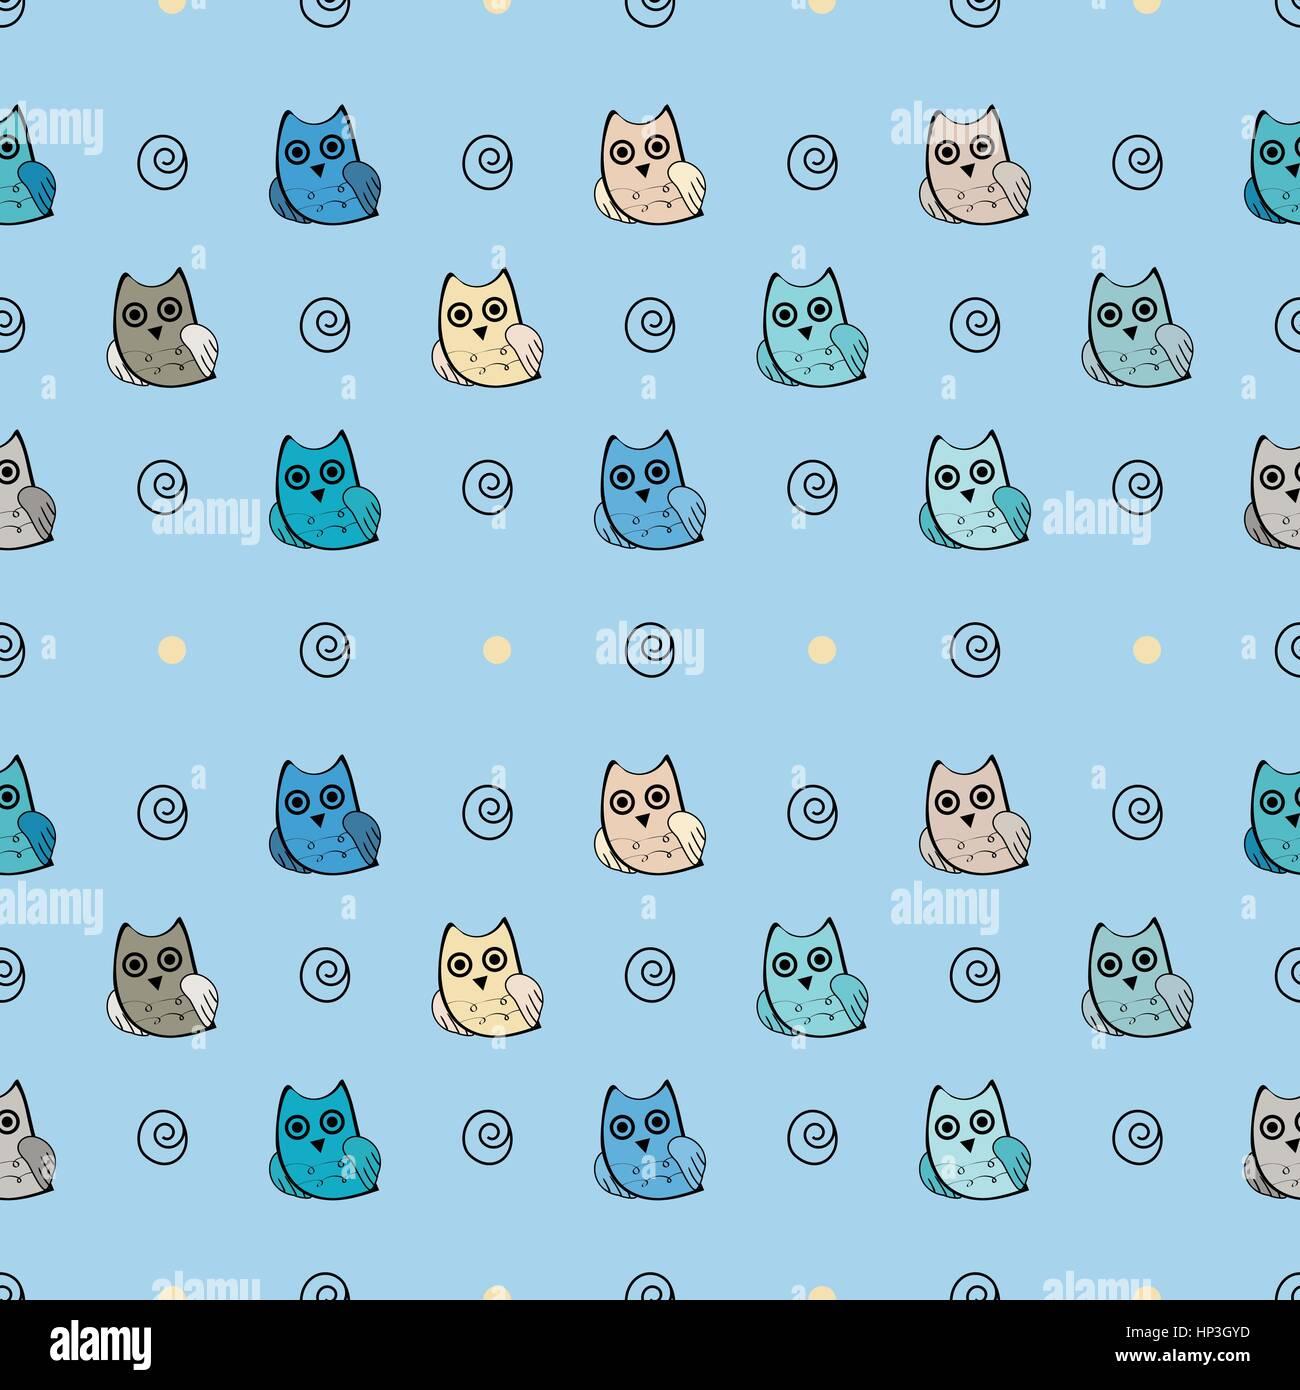 Owl vector seamless pattern - Stock Vector